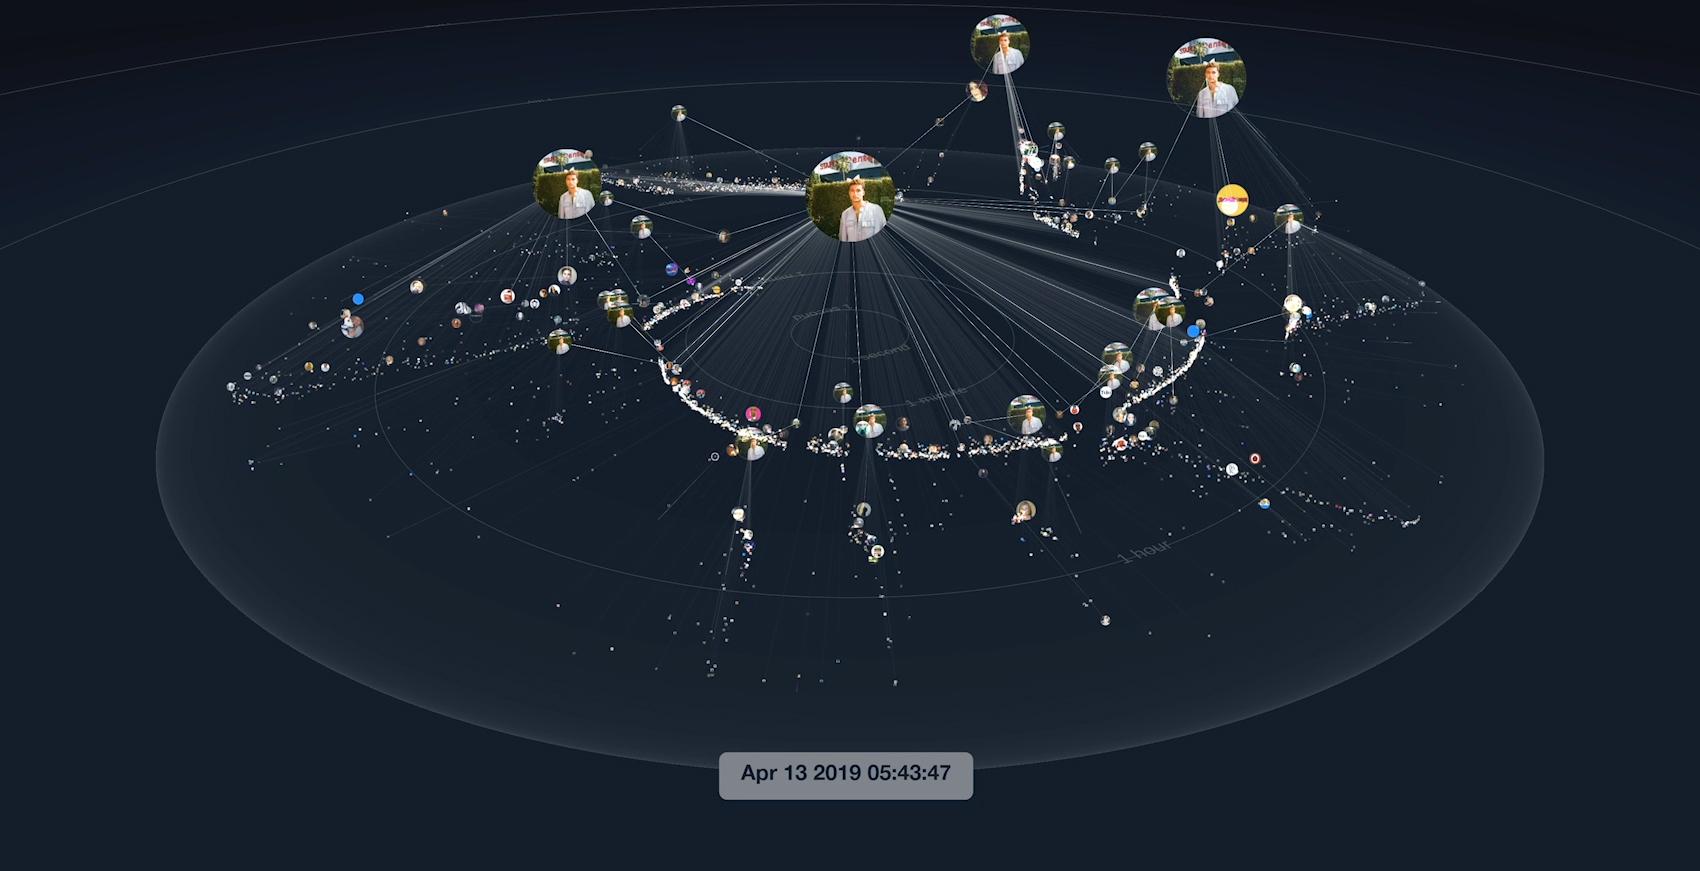 dataviz of Twitter conversation initiated by NBA player Kyle Kuzma